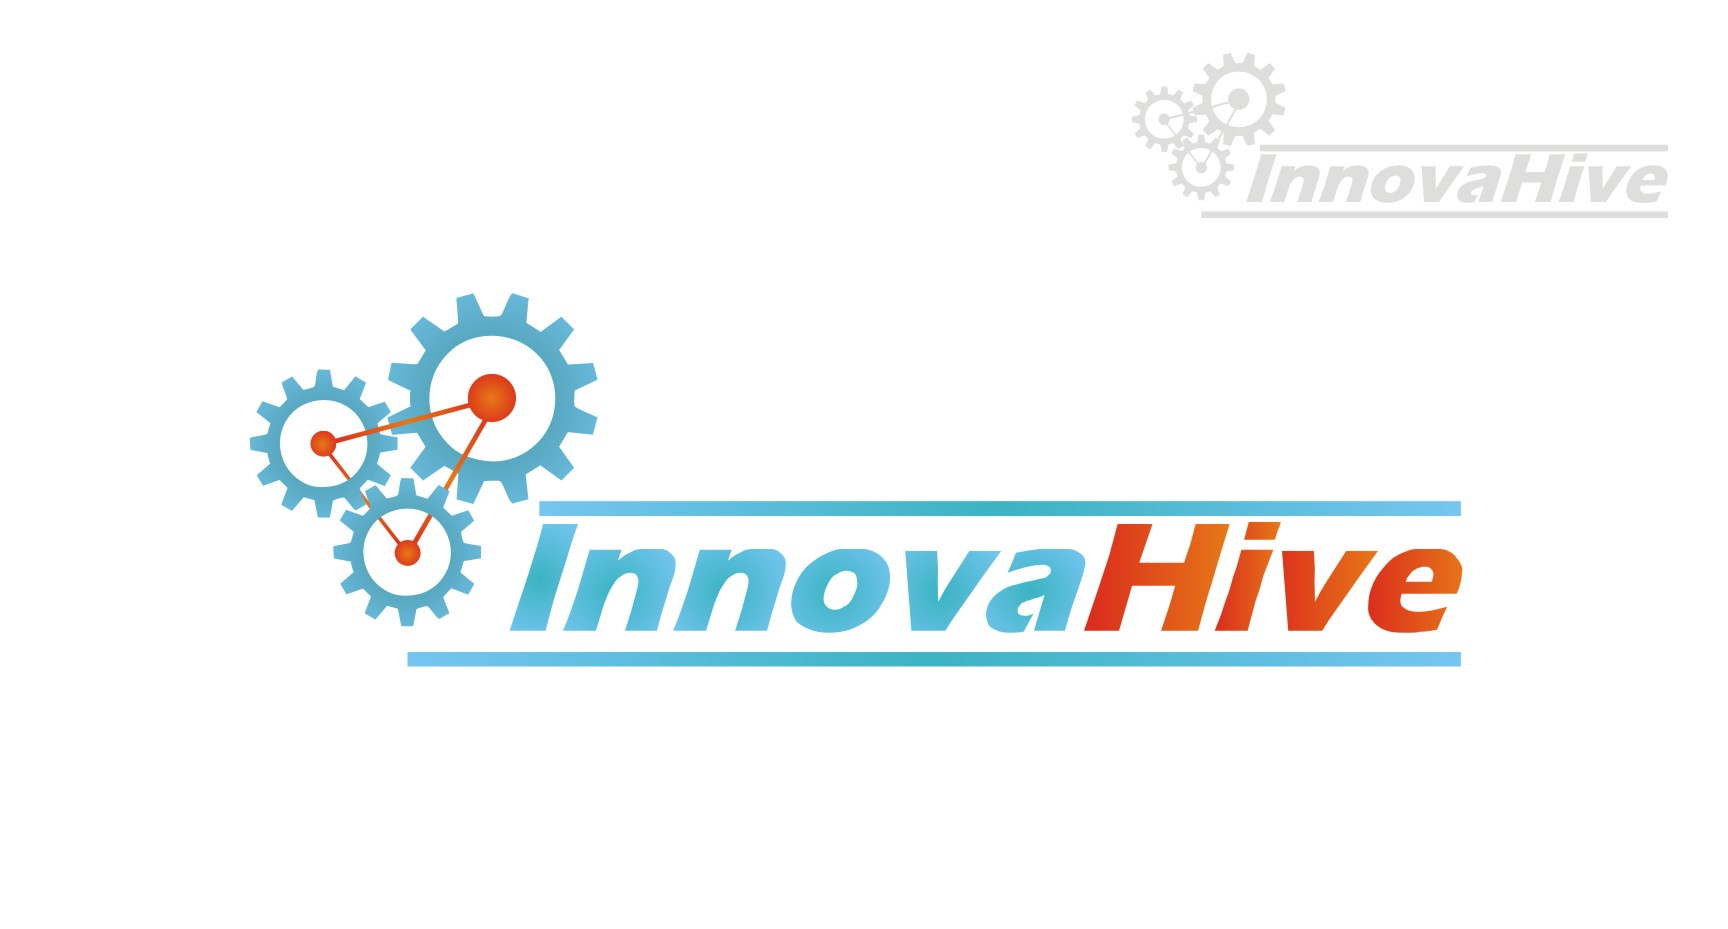 Logo Design by Yuda Hermawan - Entry No. 90 in the Logo Design Contest InnovaHive Logo Design.